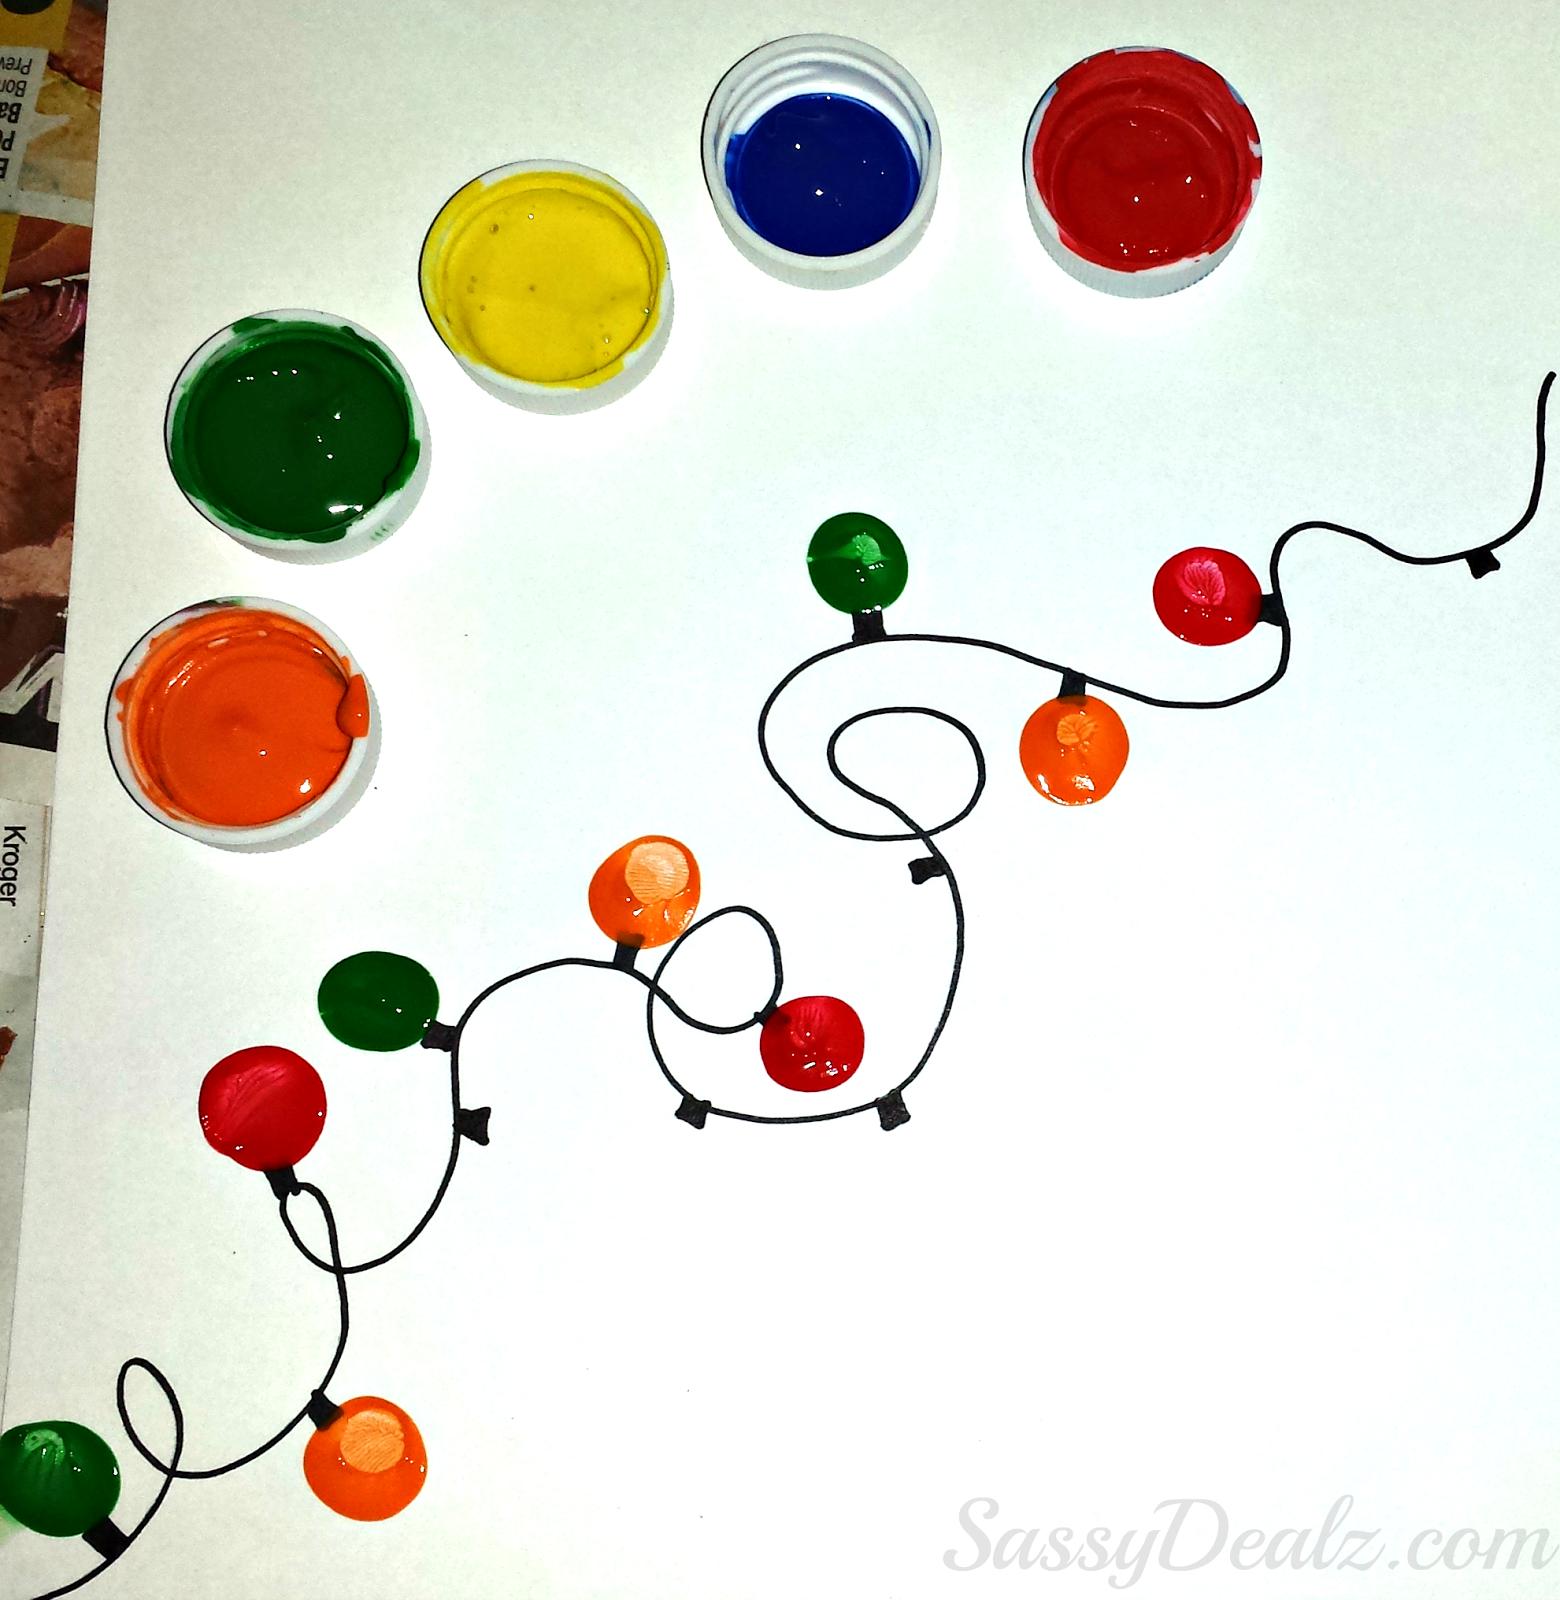 Drawn christmas lights Happy Holidays! (21) Ideas Christmas